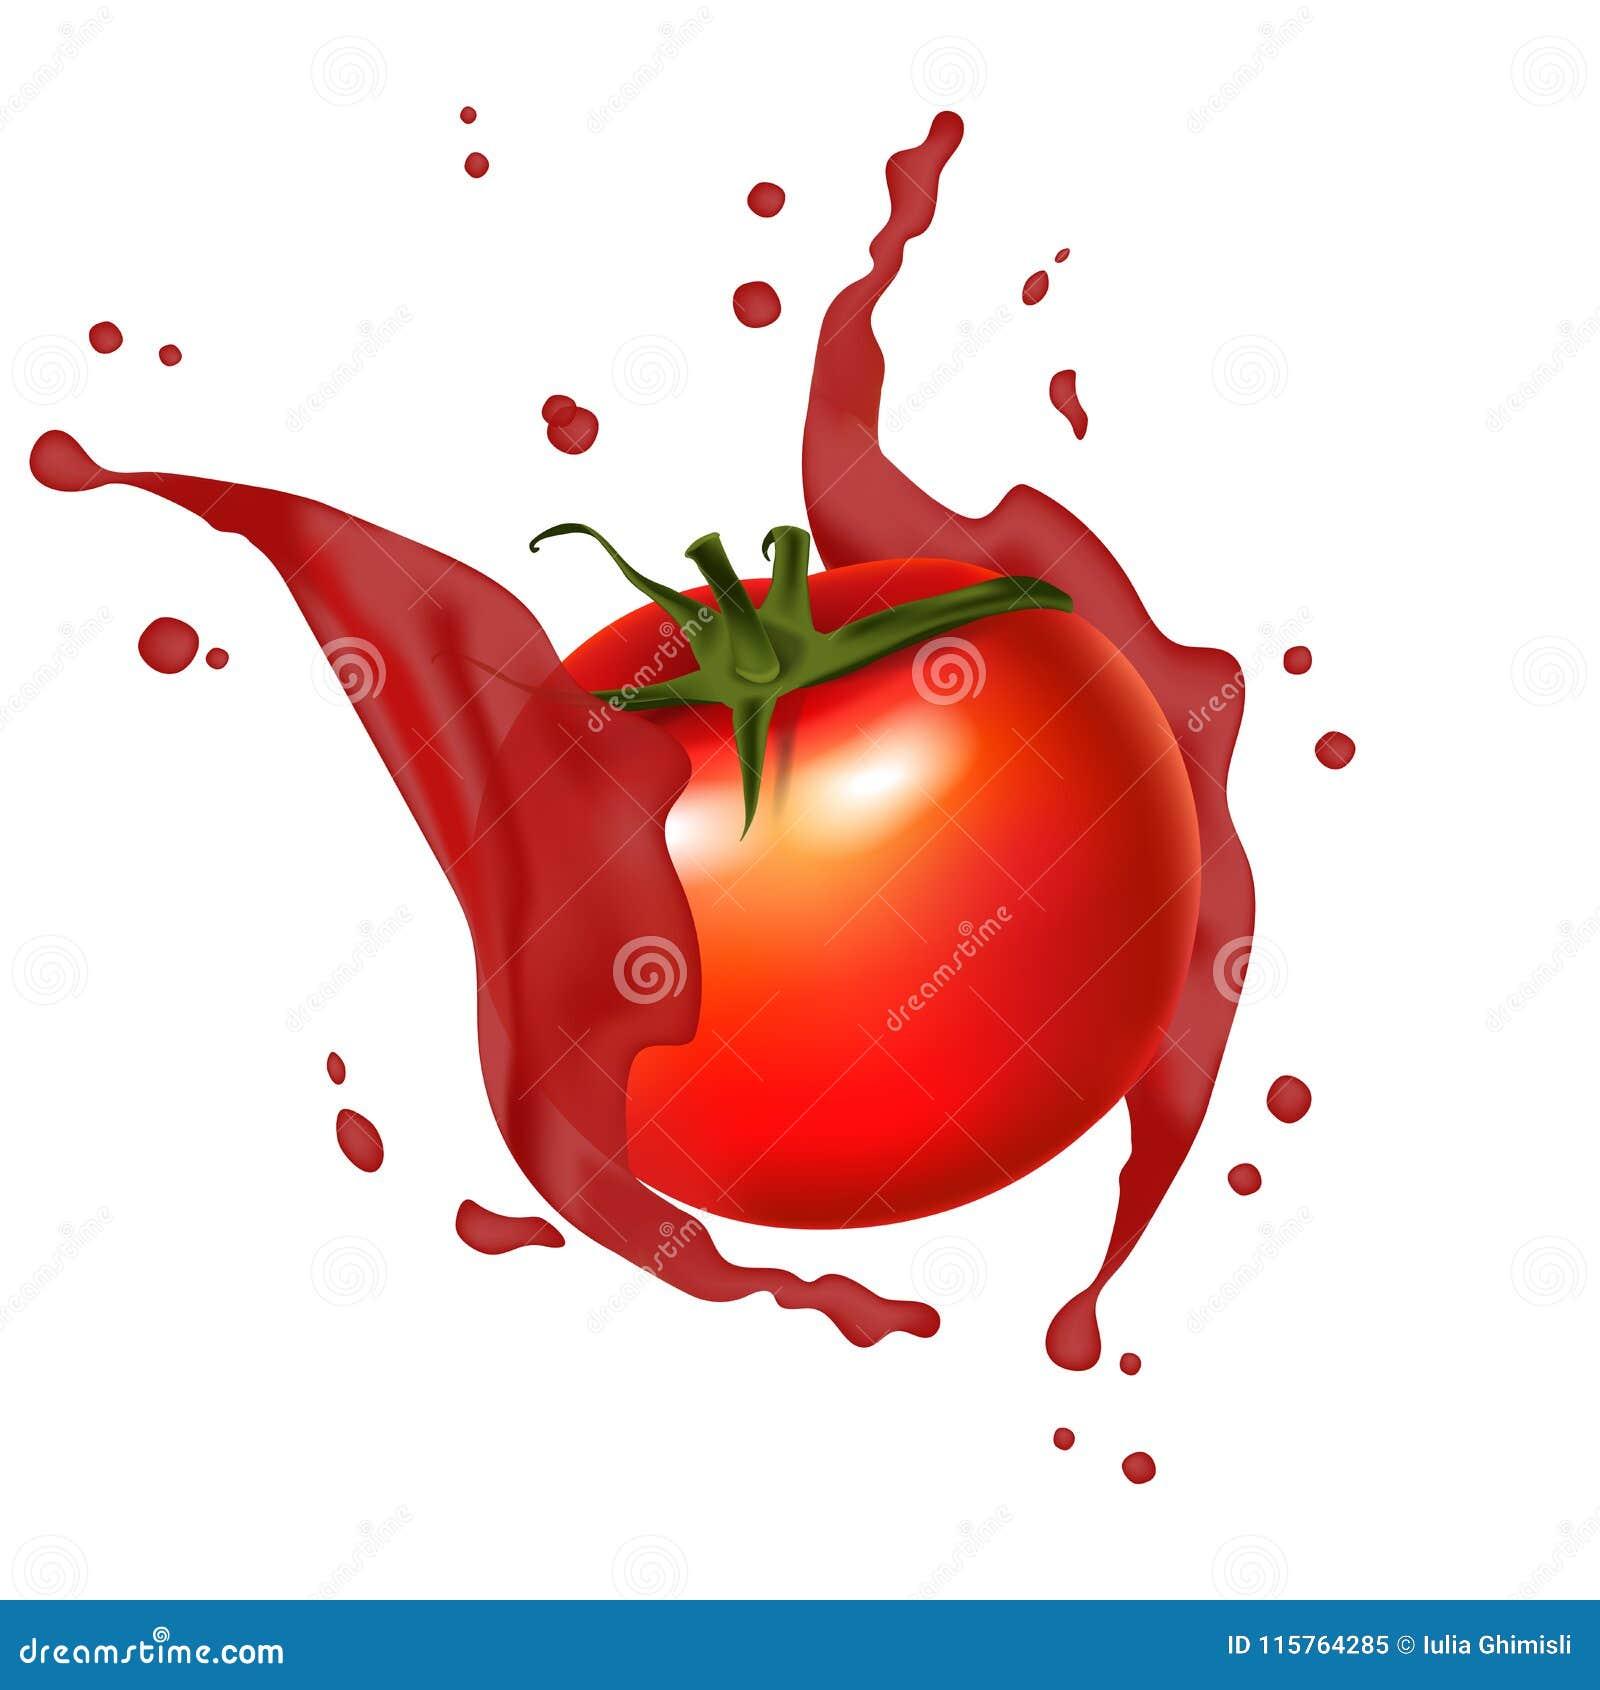 juice red tomato splashing realistic 3d juicy tomatoes splash